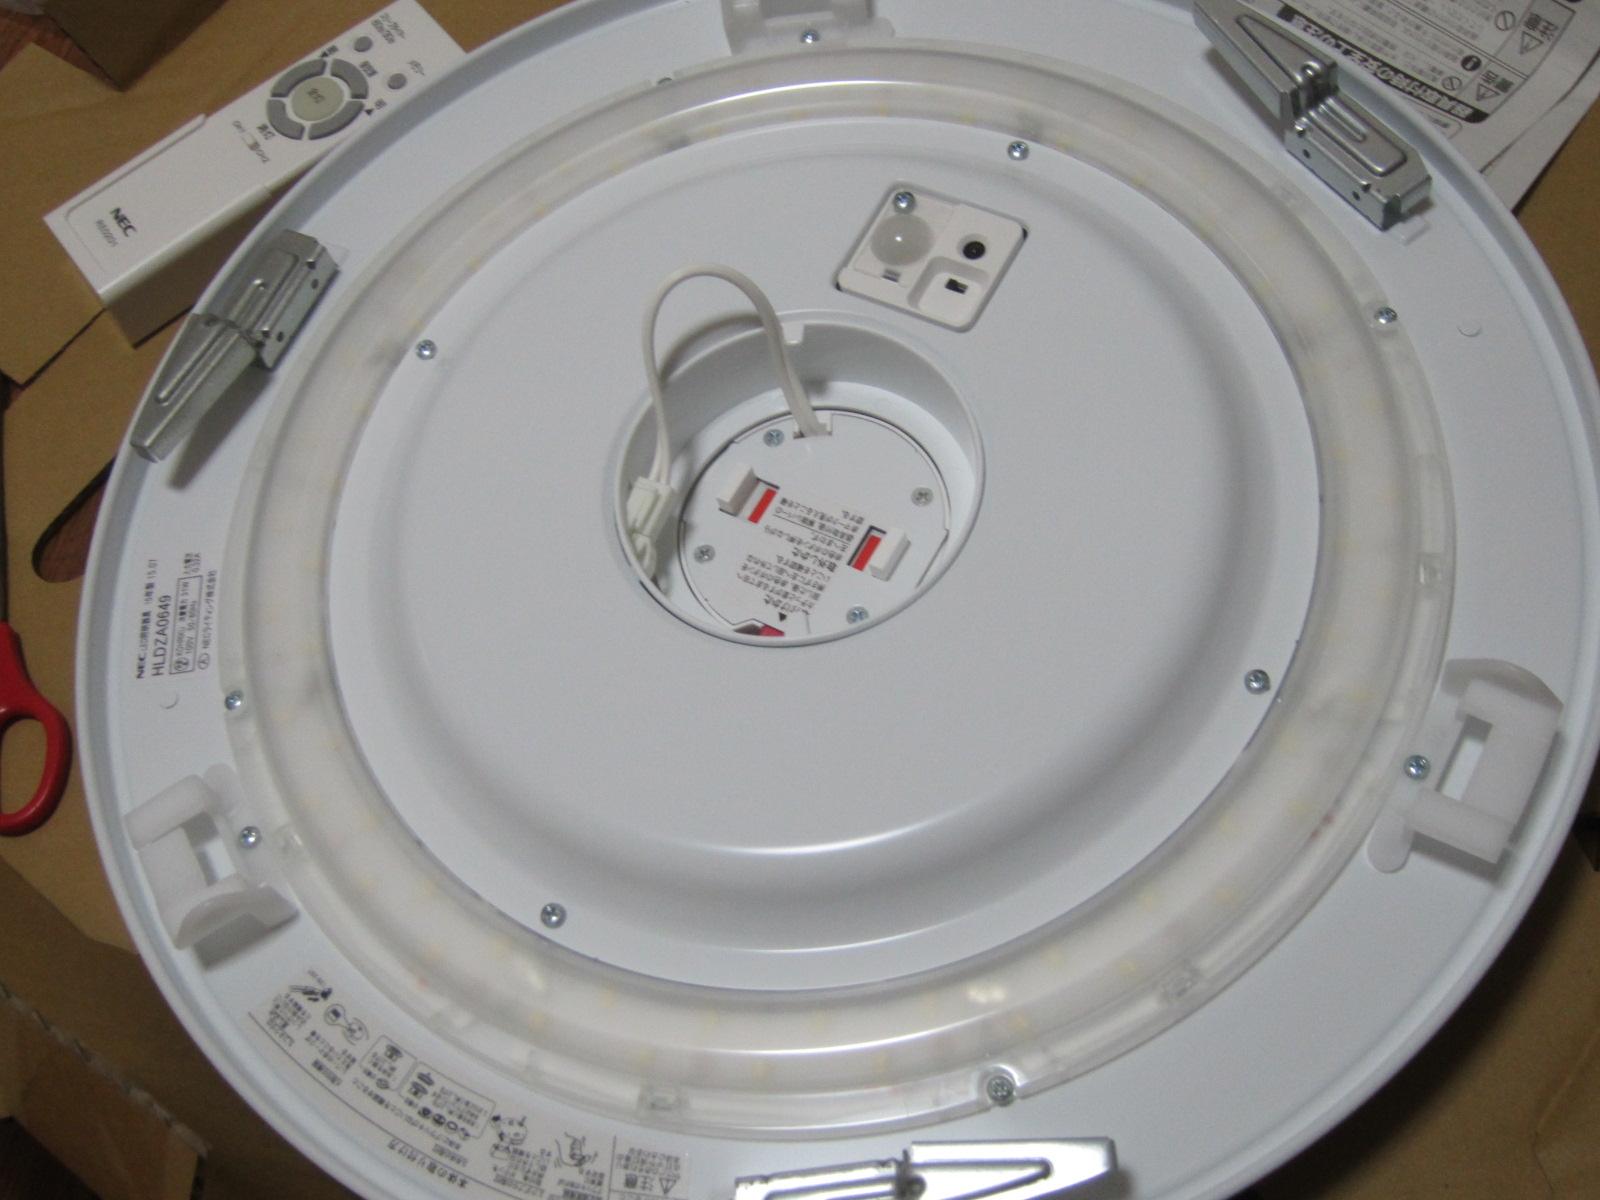 IMG 0127 - 節電用の照明器具に交換してみました